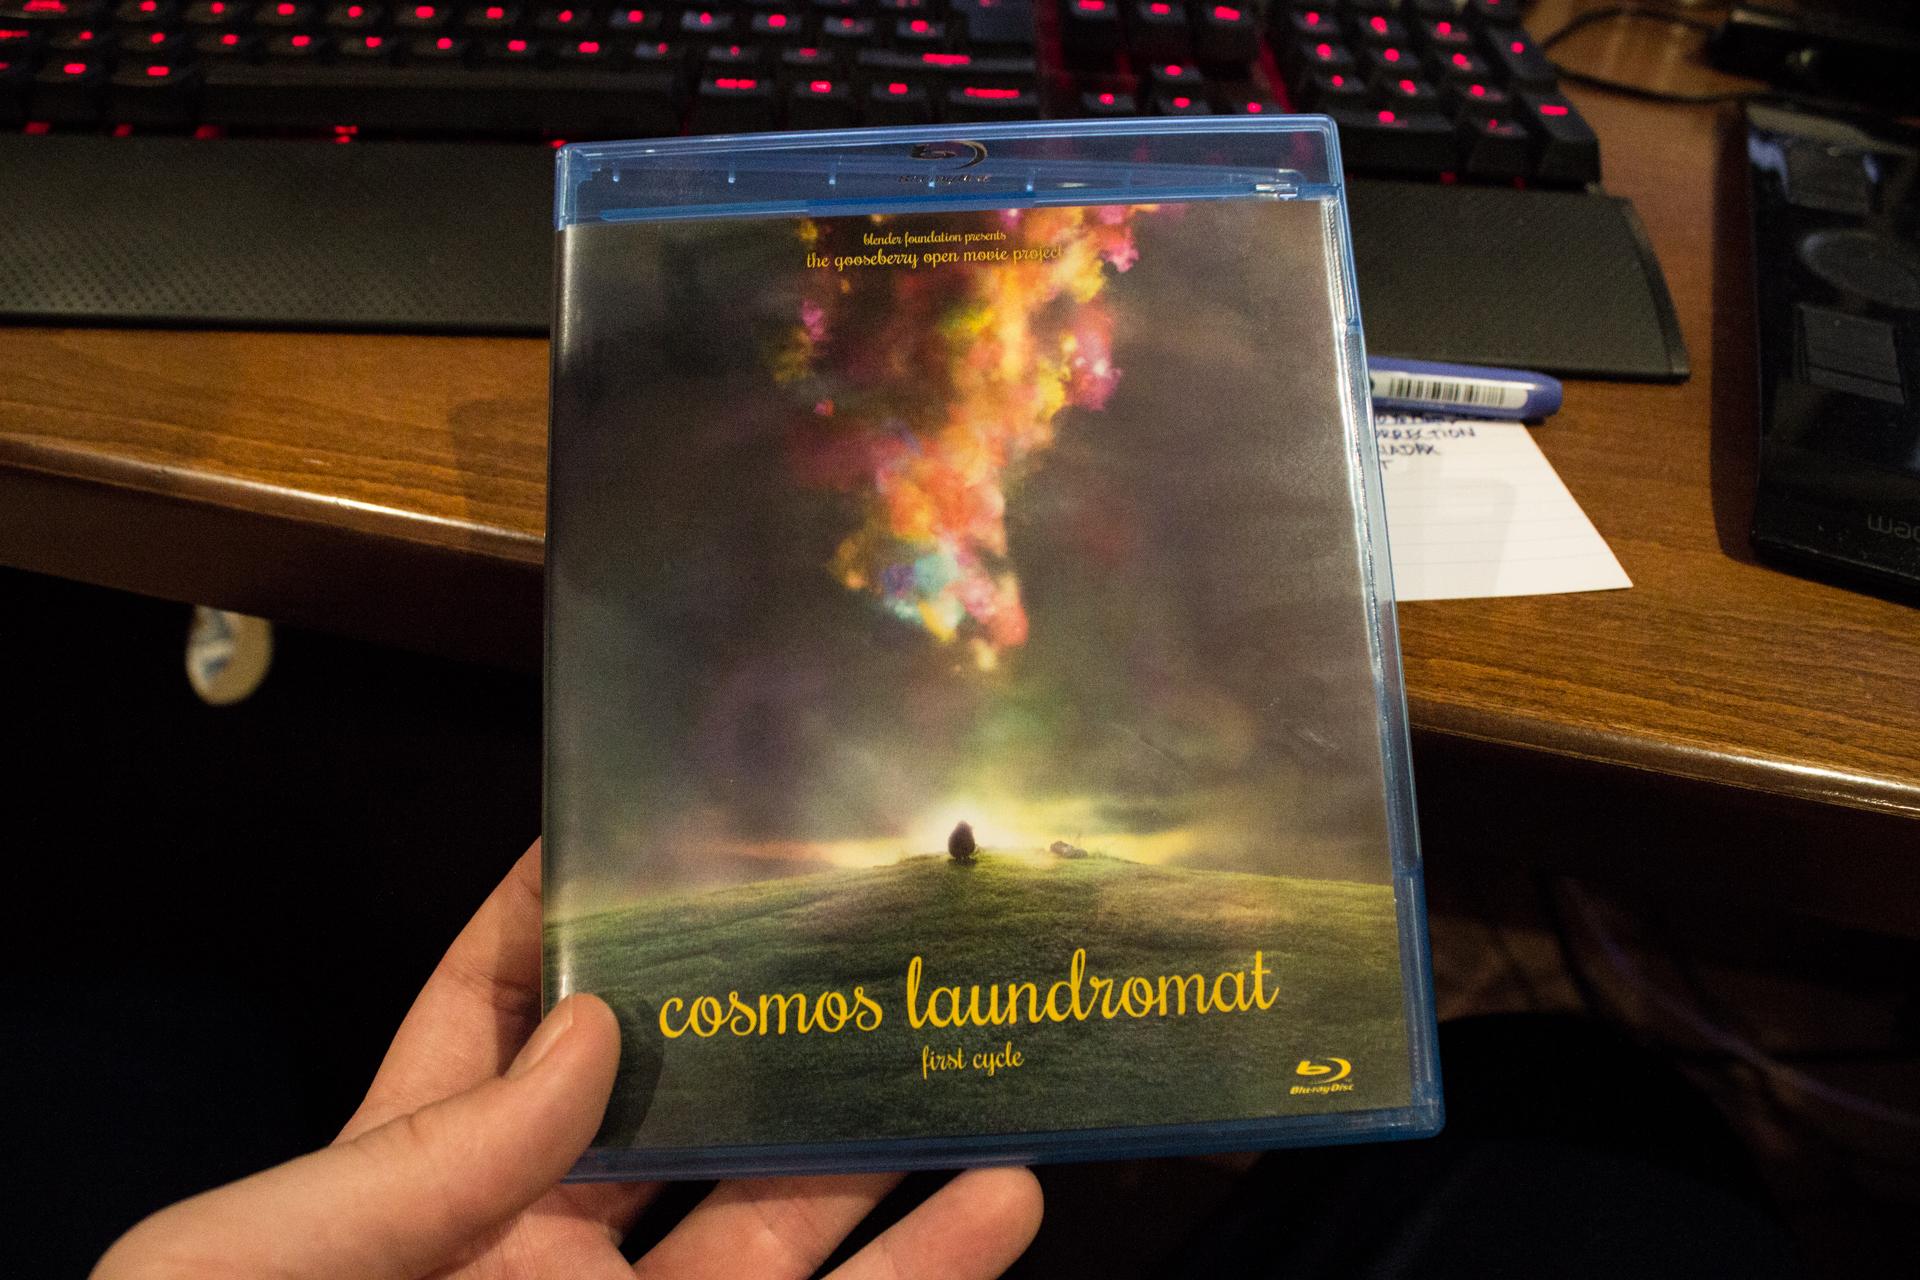 CosmosLaundromat_BluRay.jpg